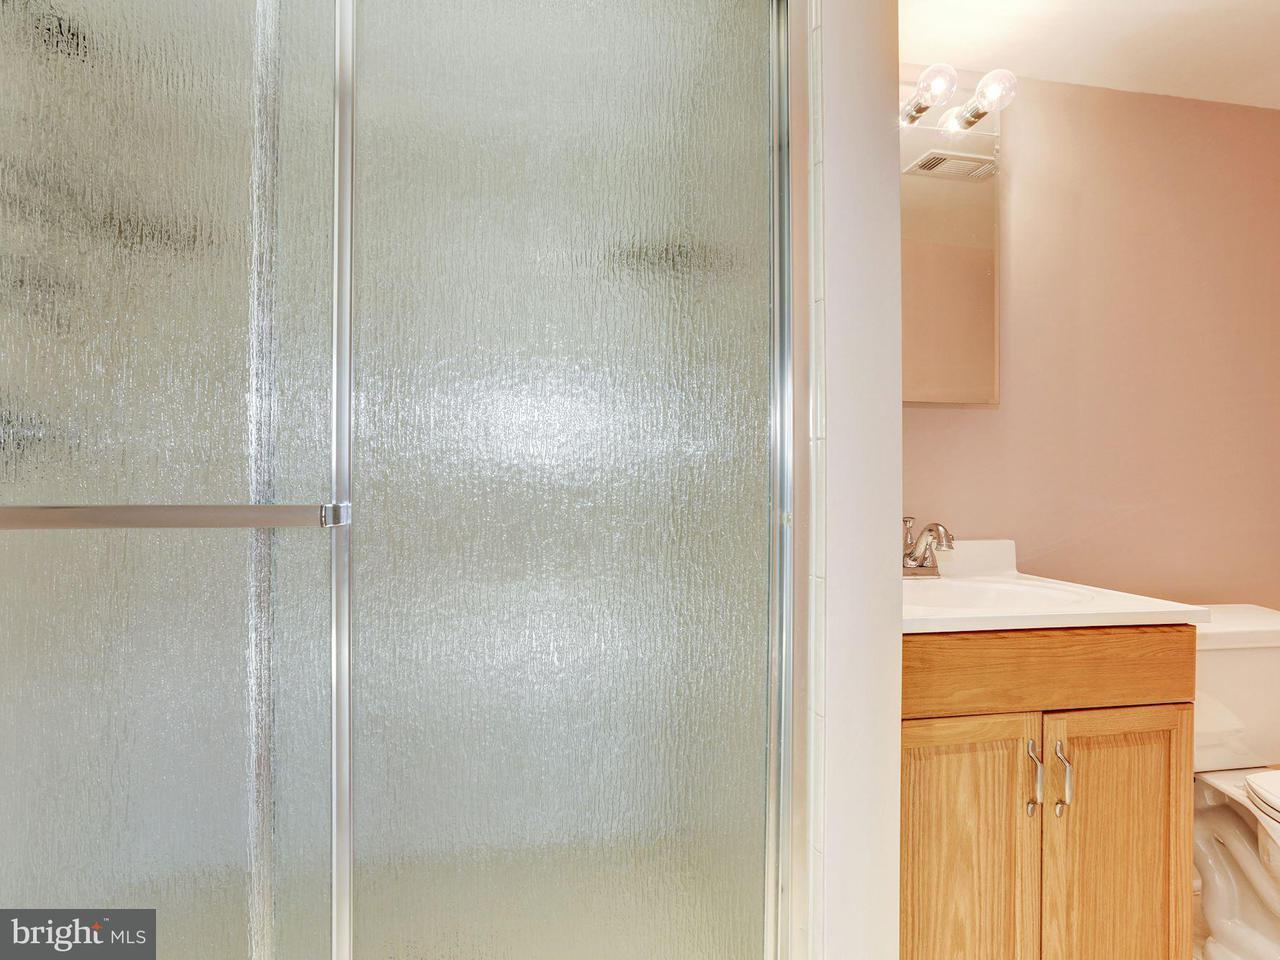 Additional photo for property listing at 8284 Raindrop Way 8284 Raindrop Way Springfield, Virginia 22153 Vereinigte Staaten